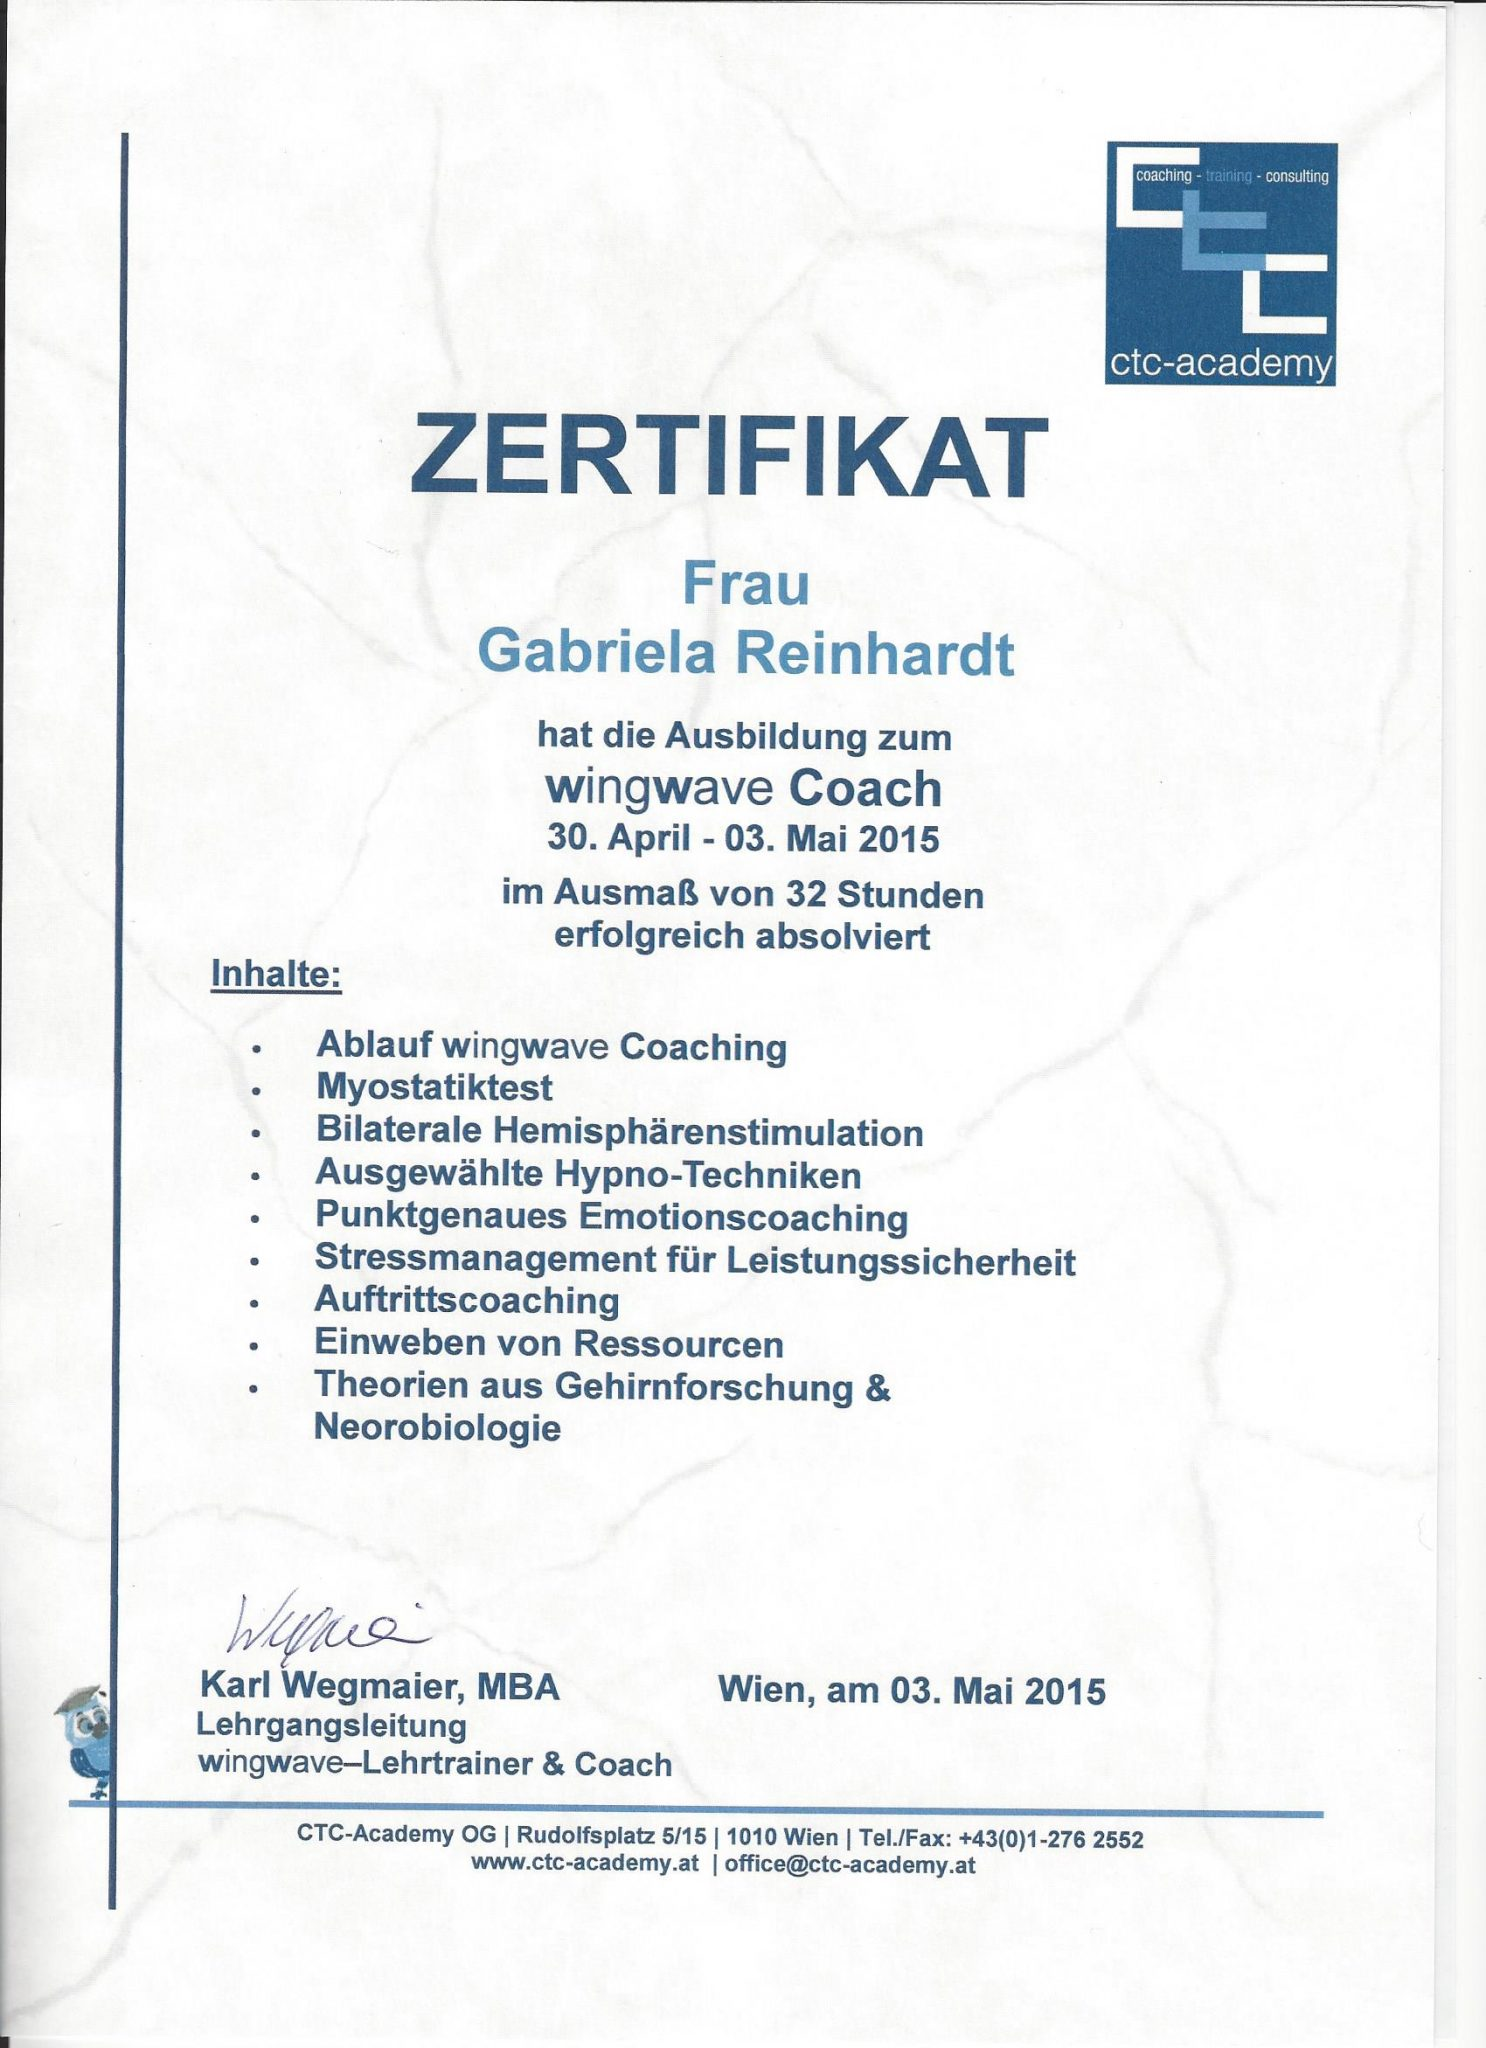 RGH-Consulting | Gabriela Reinhardt | Zertifikate | Zertifikat wingwave Coach